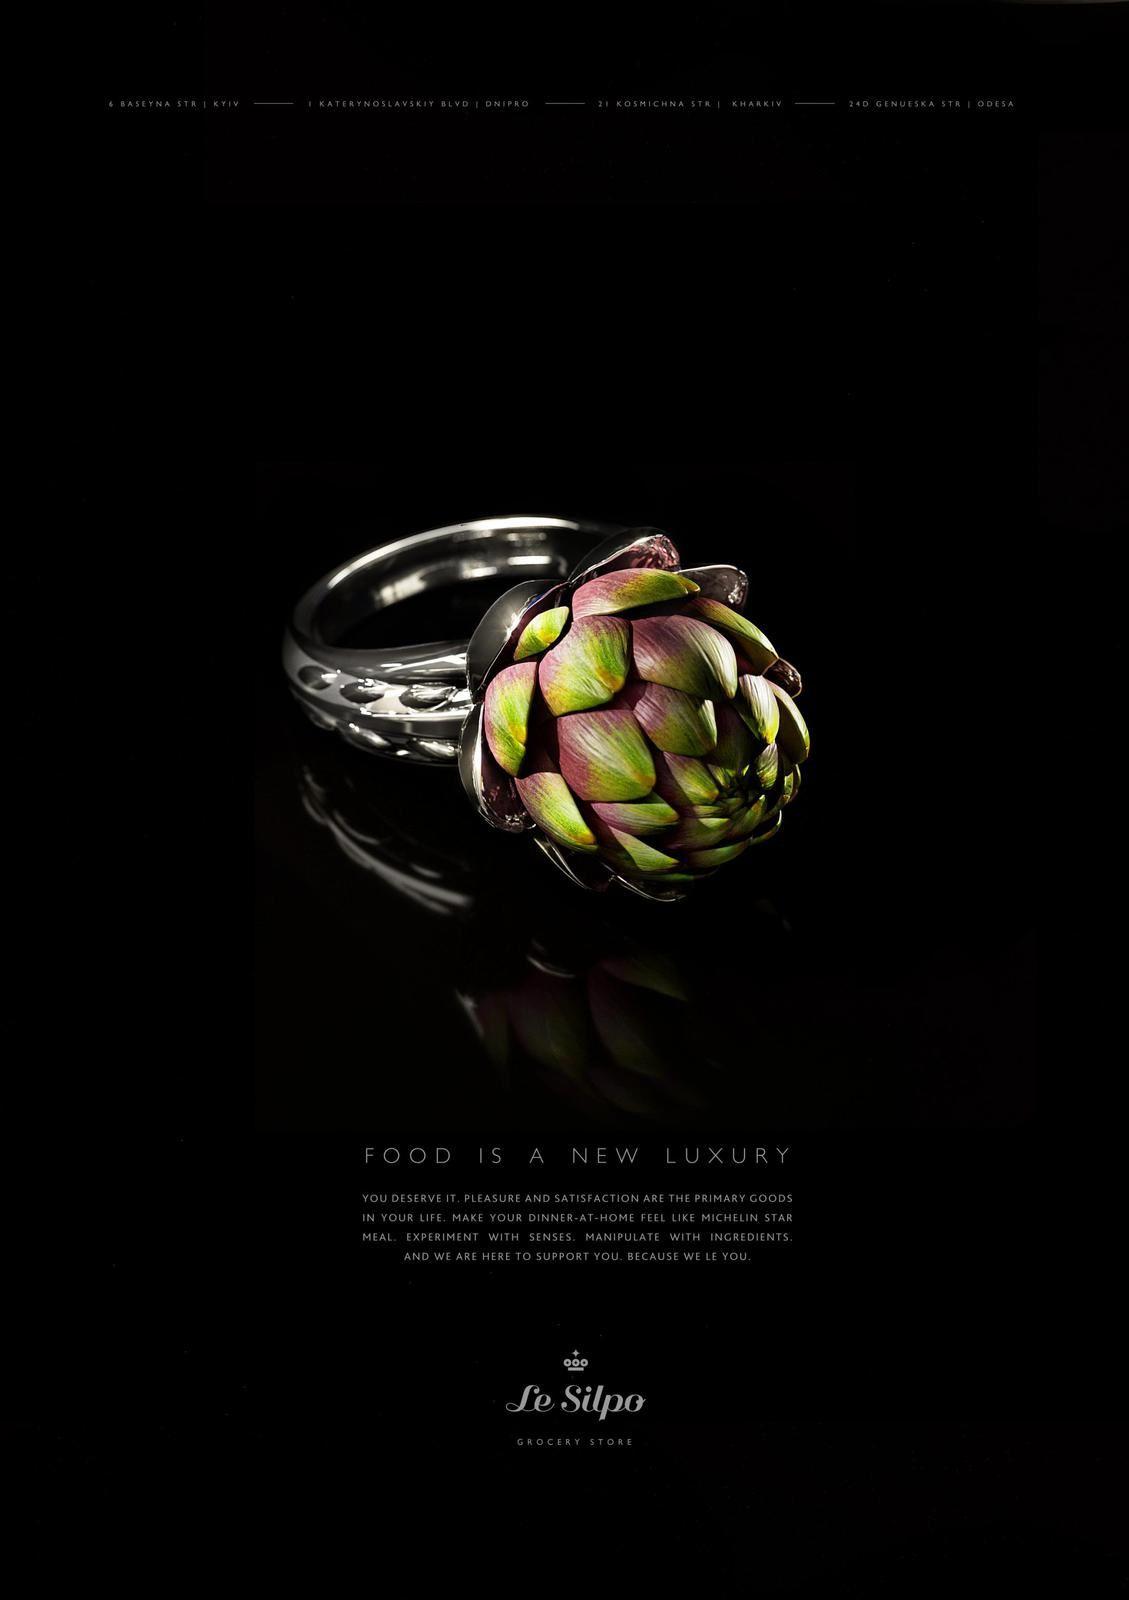 "Le Silpo Delicacy Grocery - ""Food is a New Luxury"" I Agence : Tough Slate Design, Kyiv, Ukraine (août 2017)"